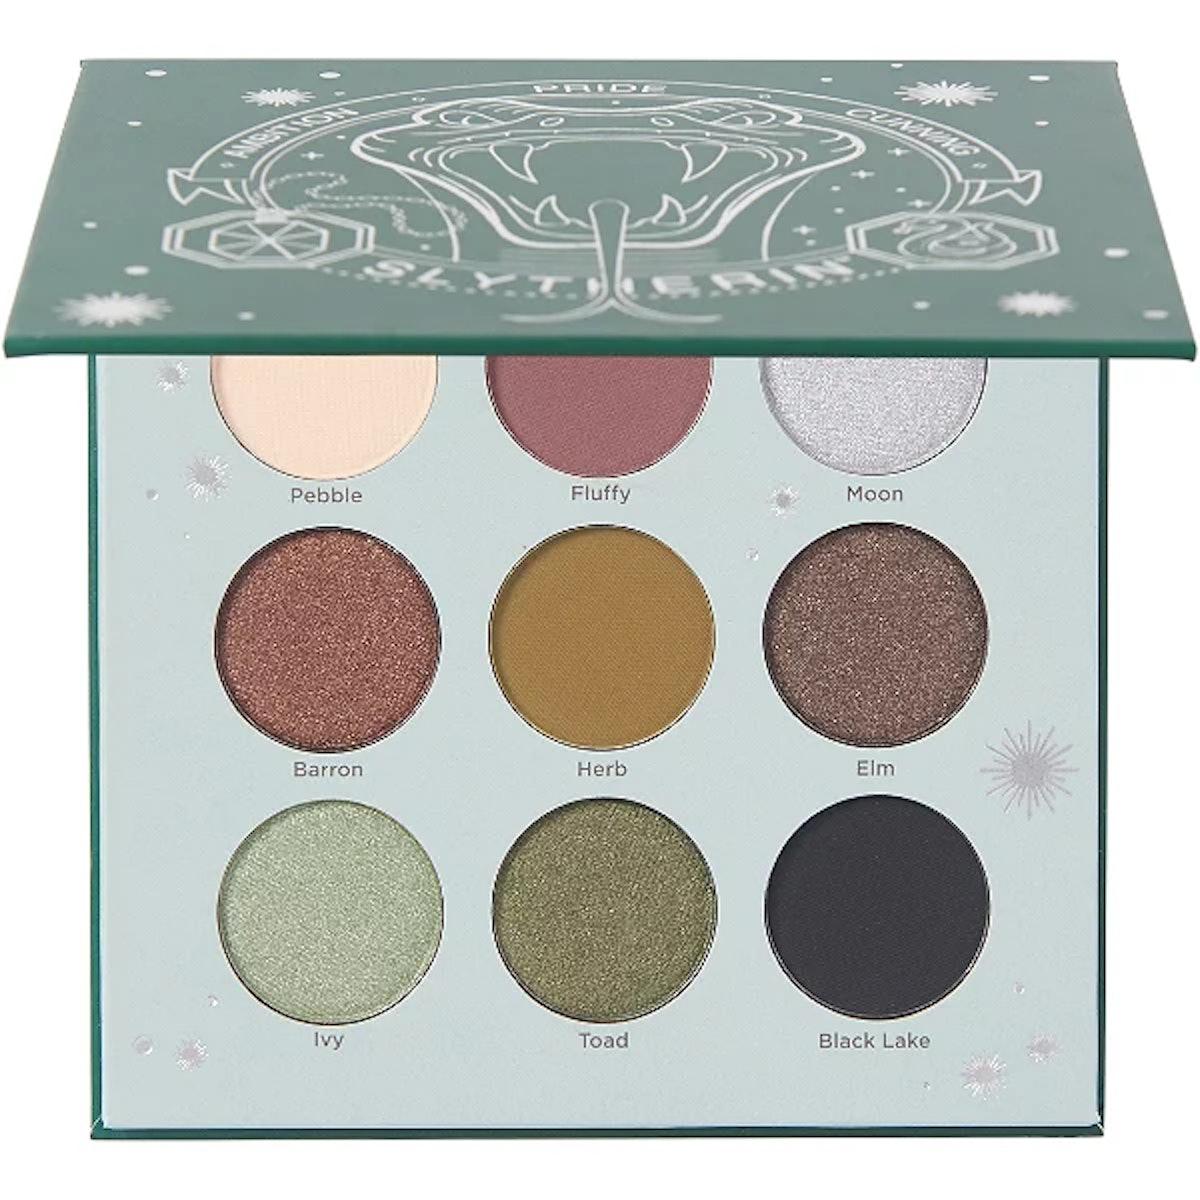 Harry Potter X Ulta Beauty Slytherin Eye Shadow Palette